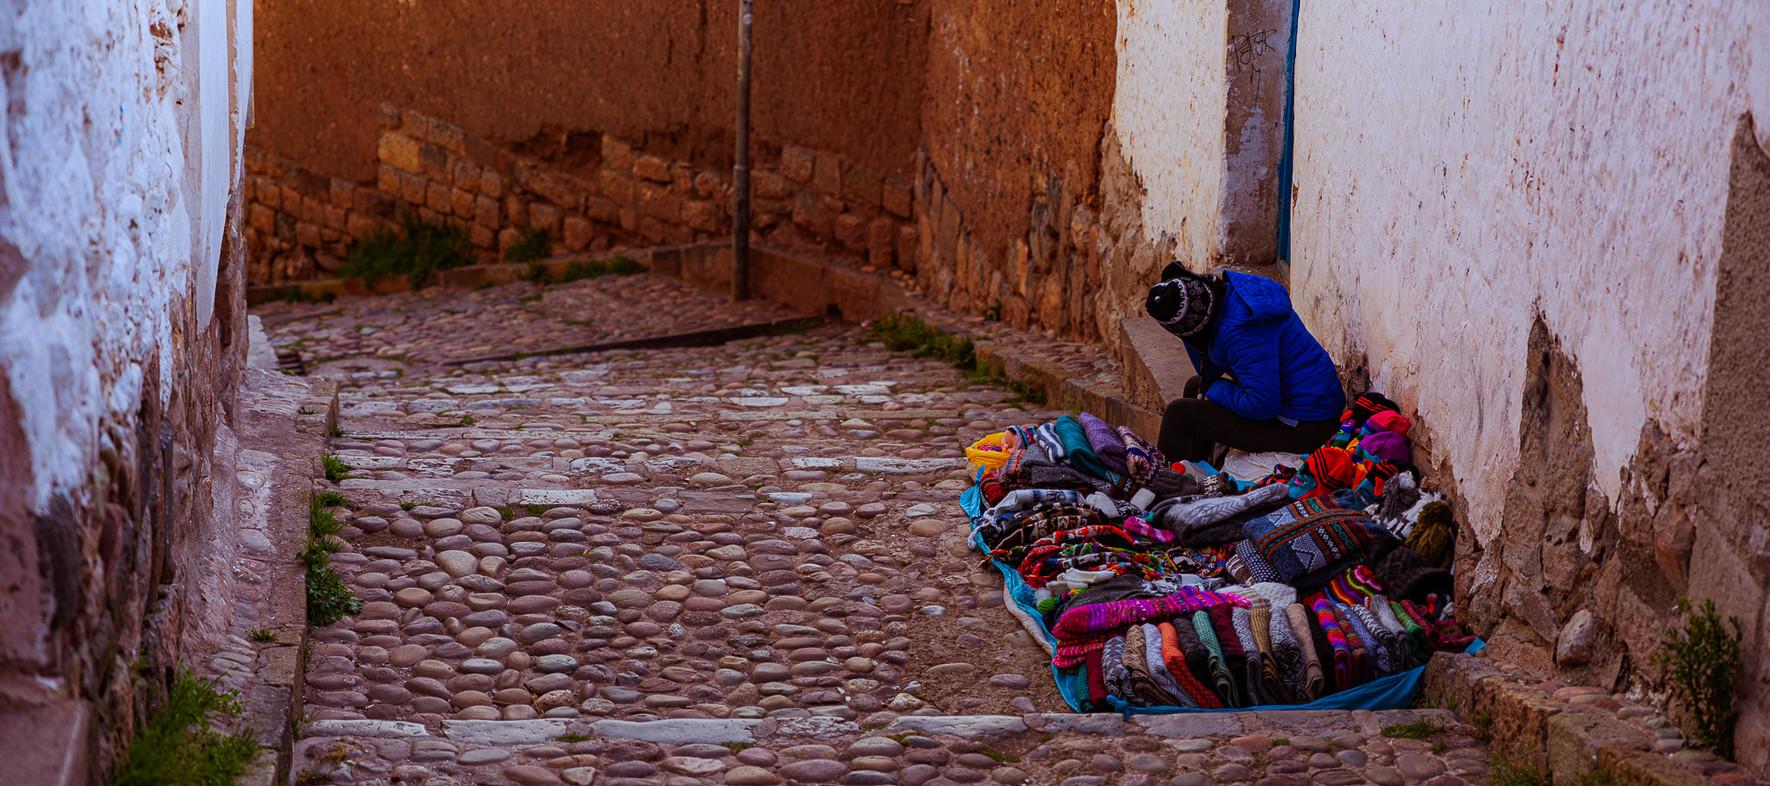 TKPA-Cusco201802-0014-HDWH.jpg